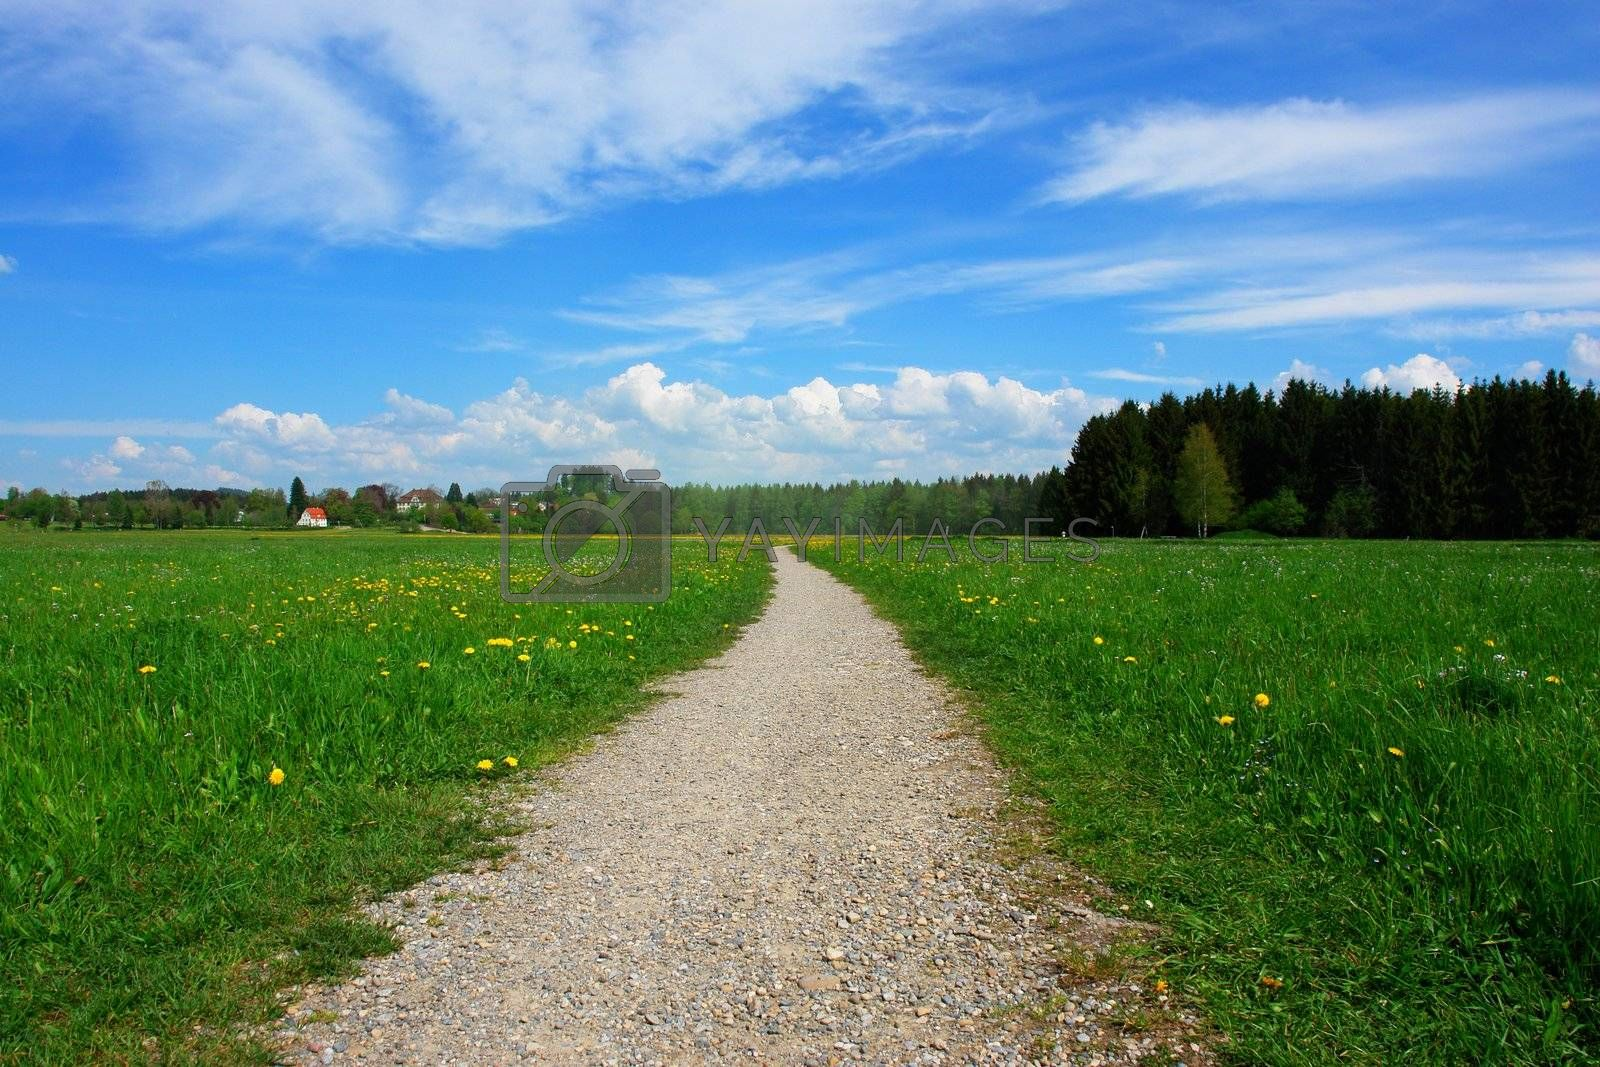 a path through a summer landscape on a sunny day